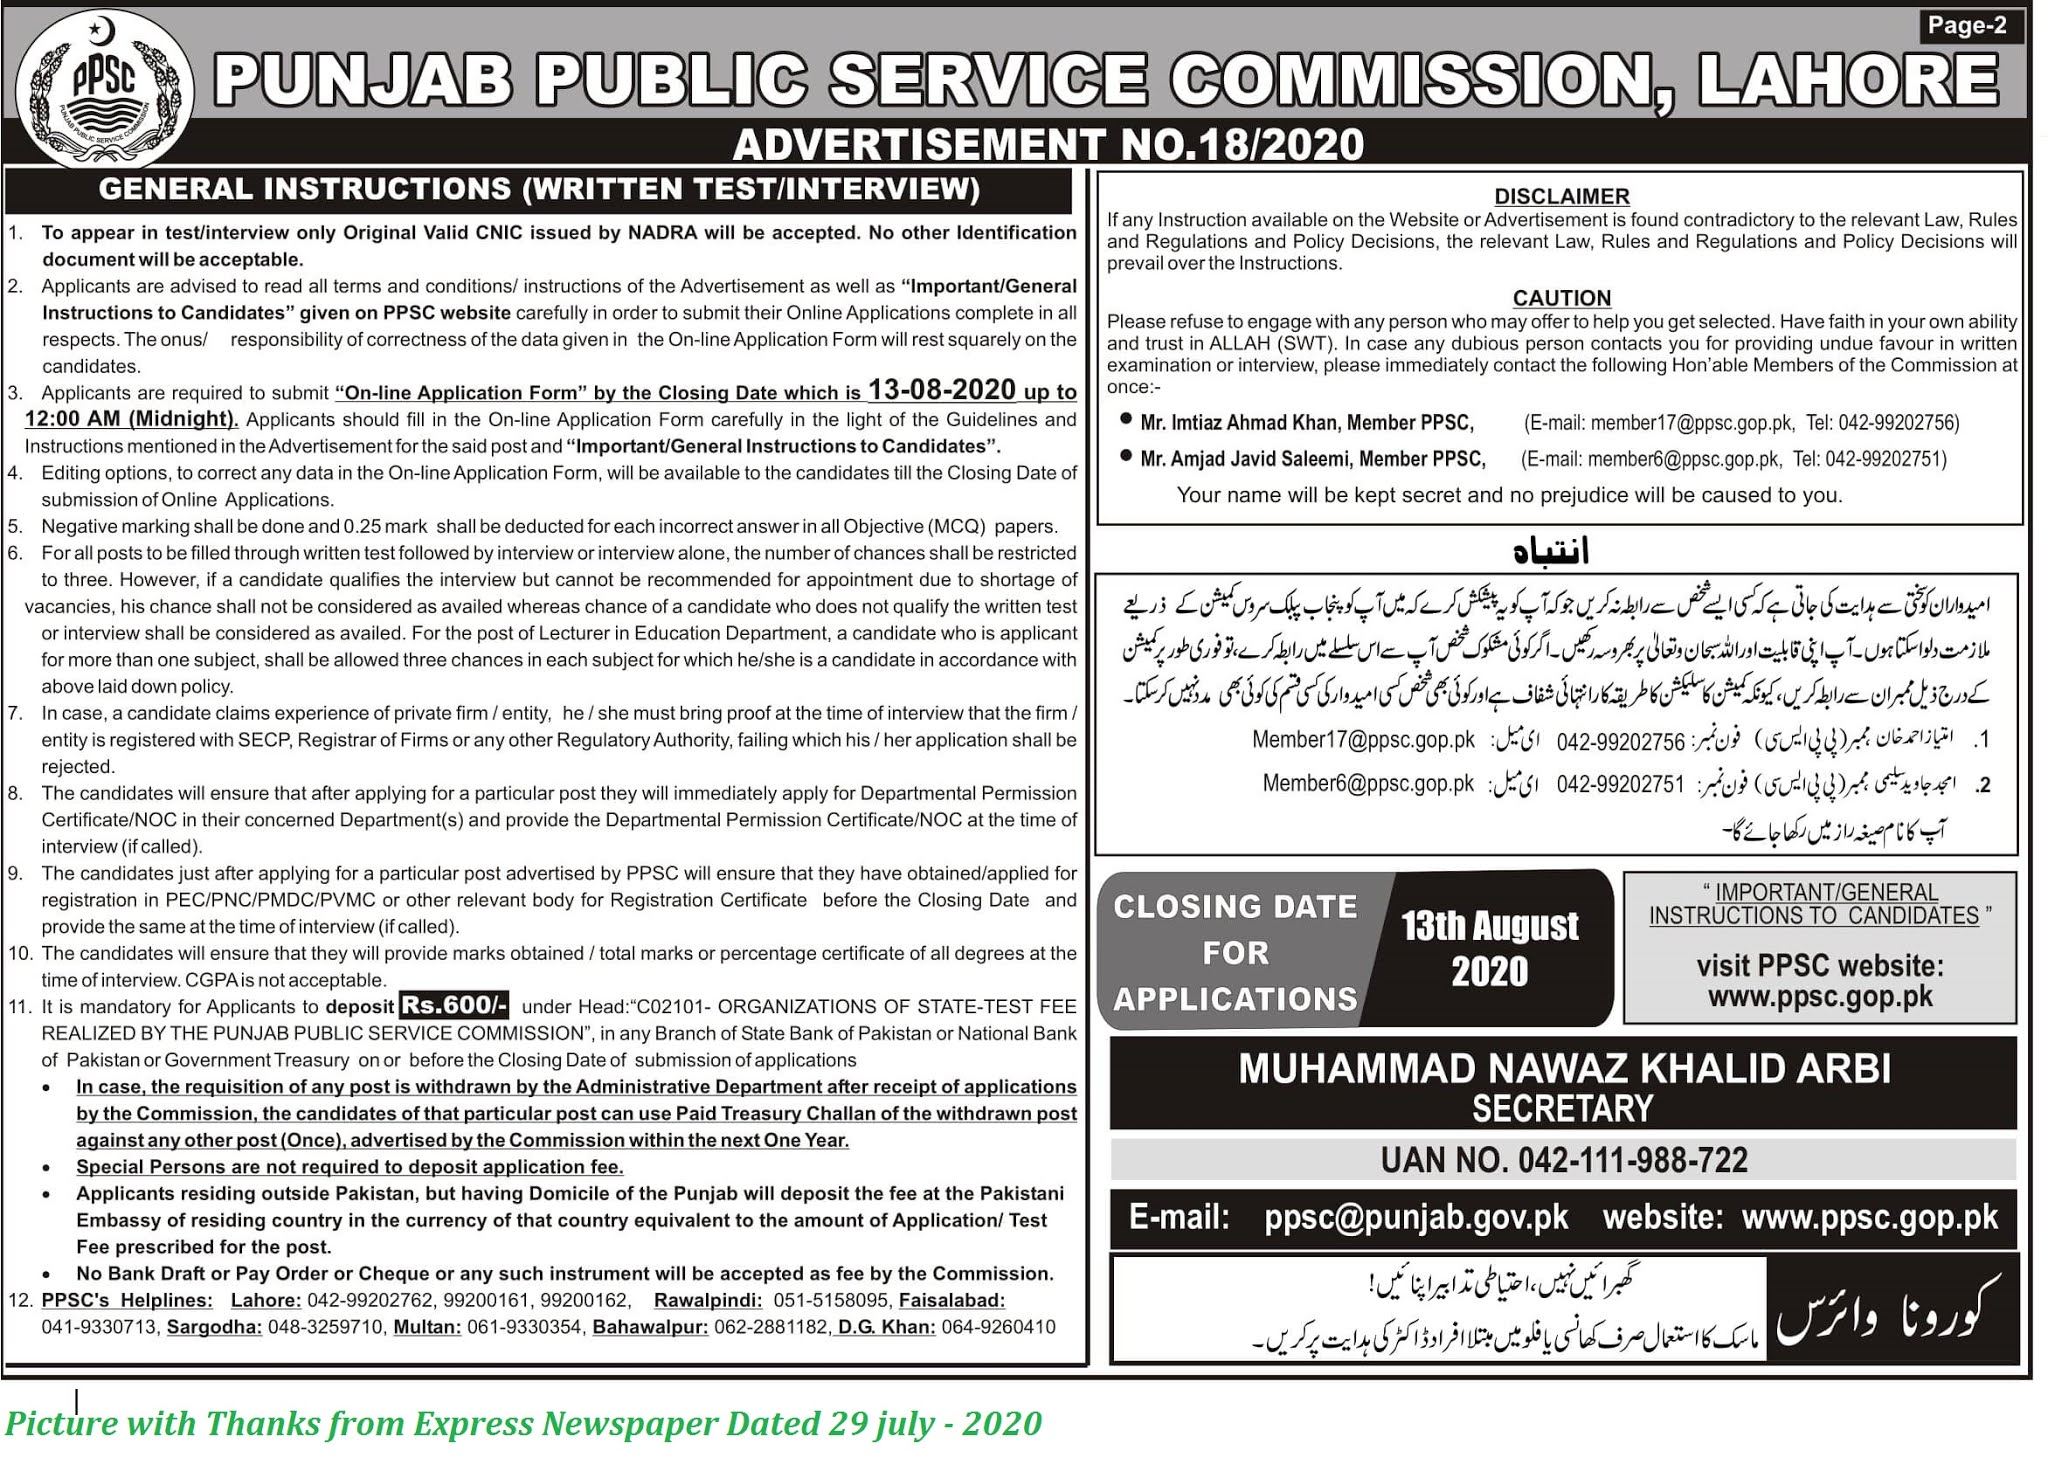 PPSC JObs 2020 - Latest PPSC Jobs August 2020 Apply Online Latest PPSC Advertisement No. 18/2020